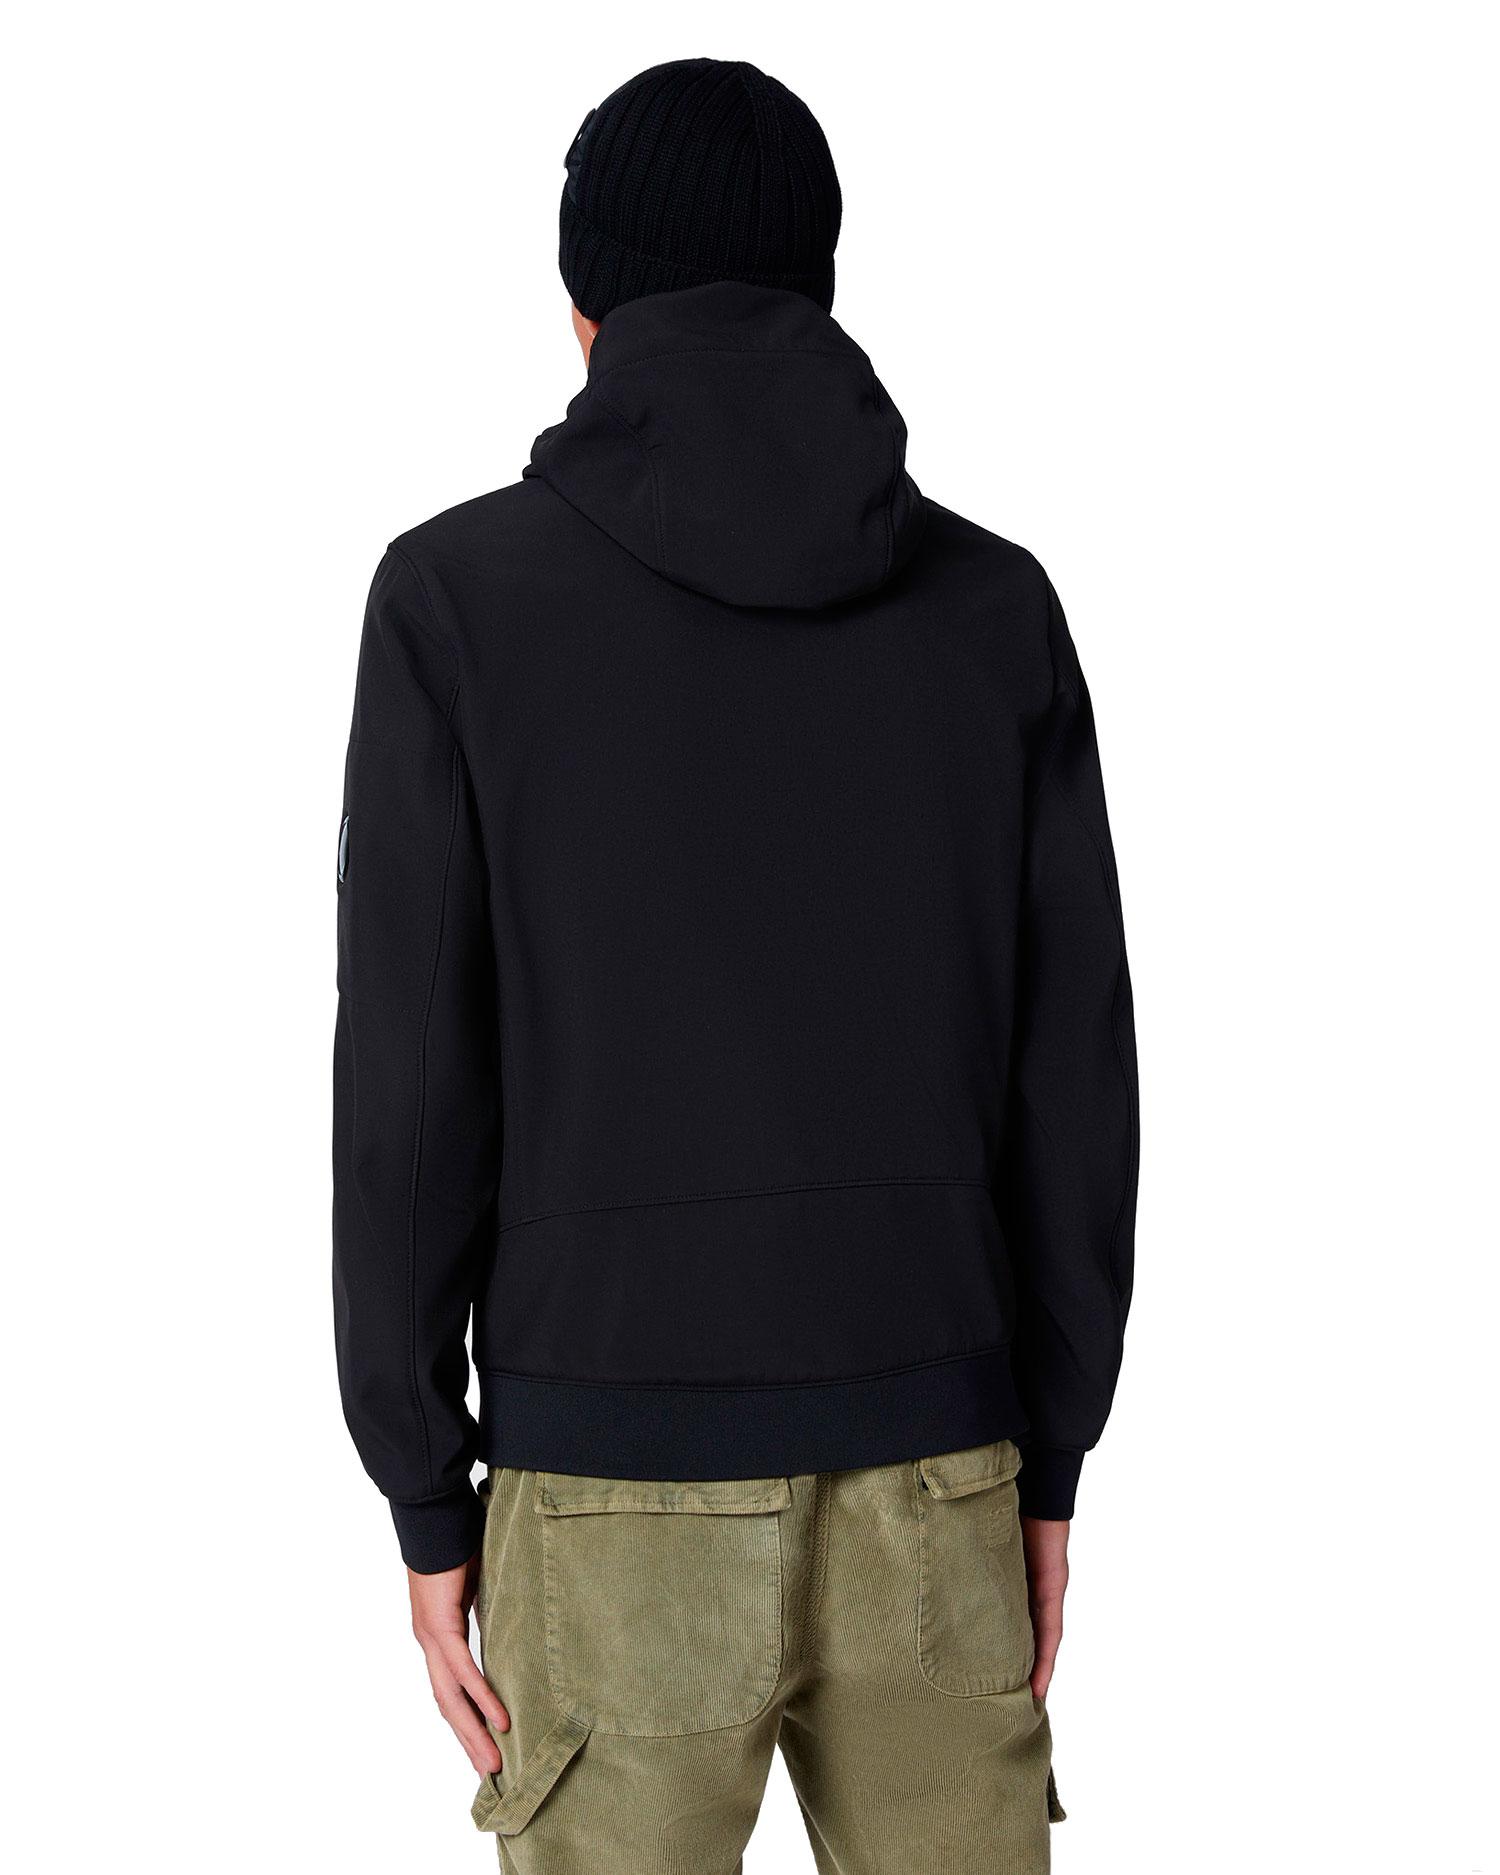 Jacket C.P. Shell with black hood C.P. COMPANY | Jackets | 09CMOW042A005784A999